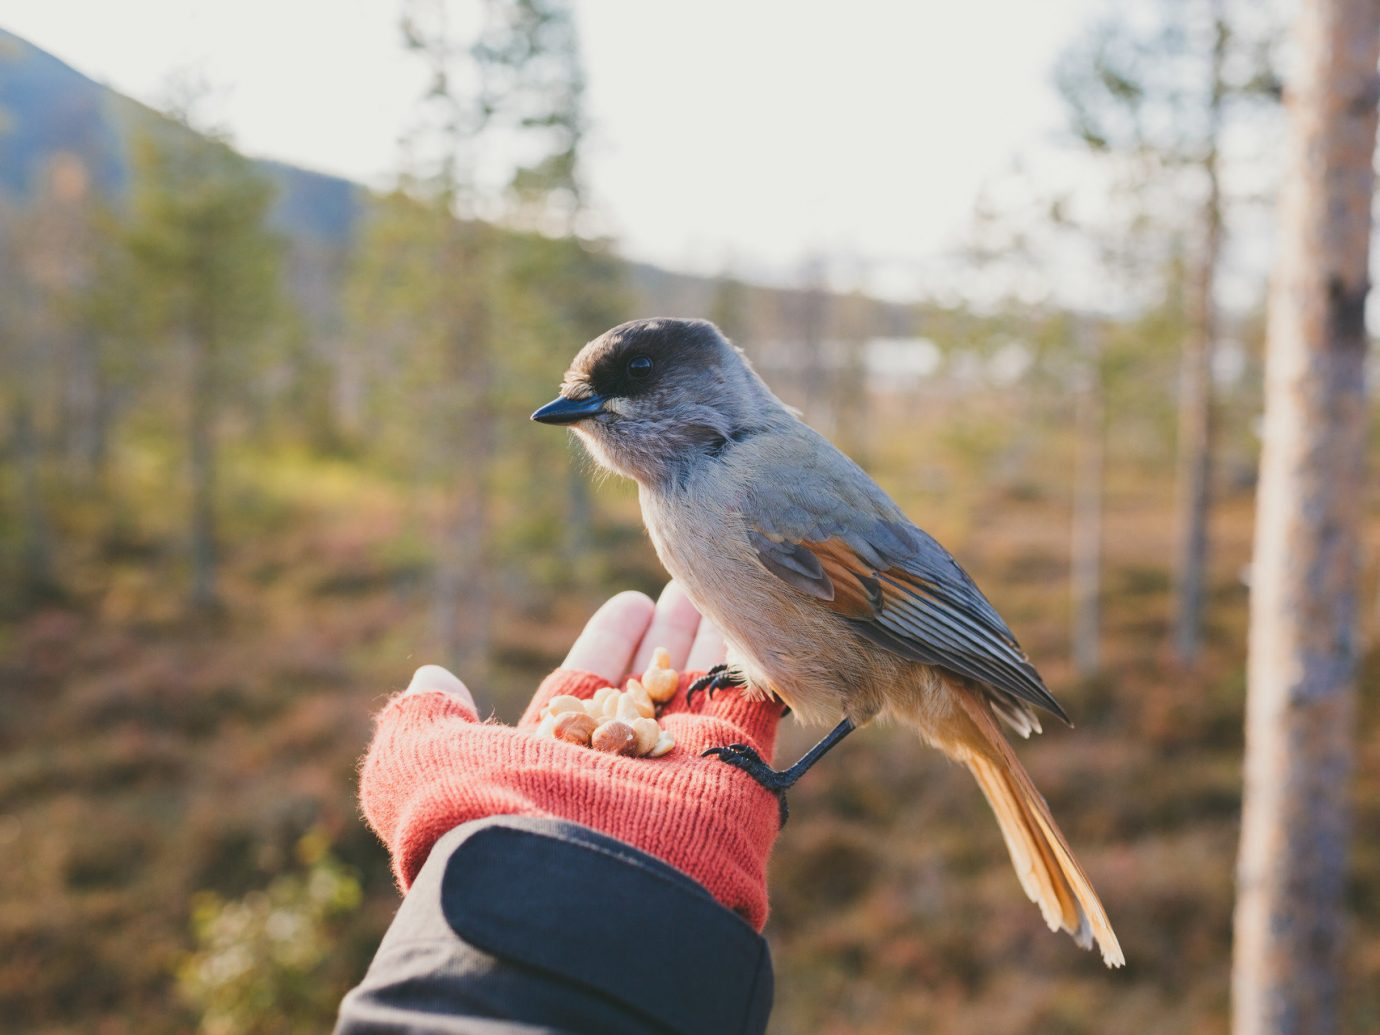 Travel Tips outdoor tree Bird sky Nature perched vertebrate Wildlife fauna jay perching bird oscine crow like bird